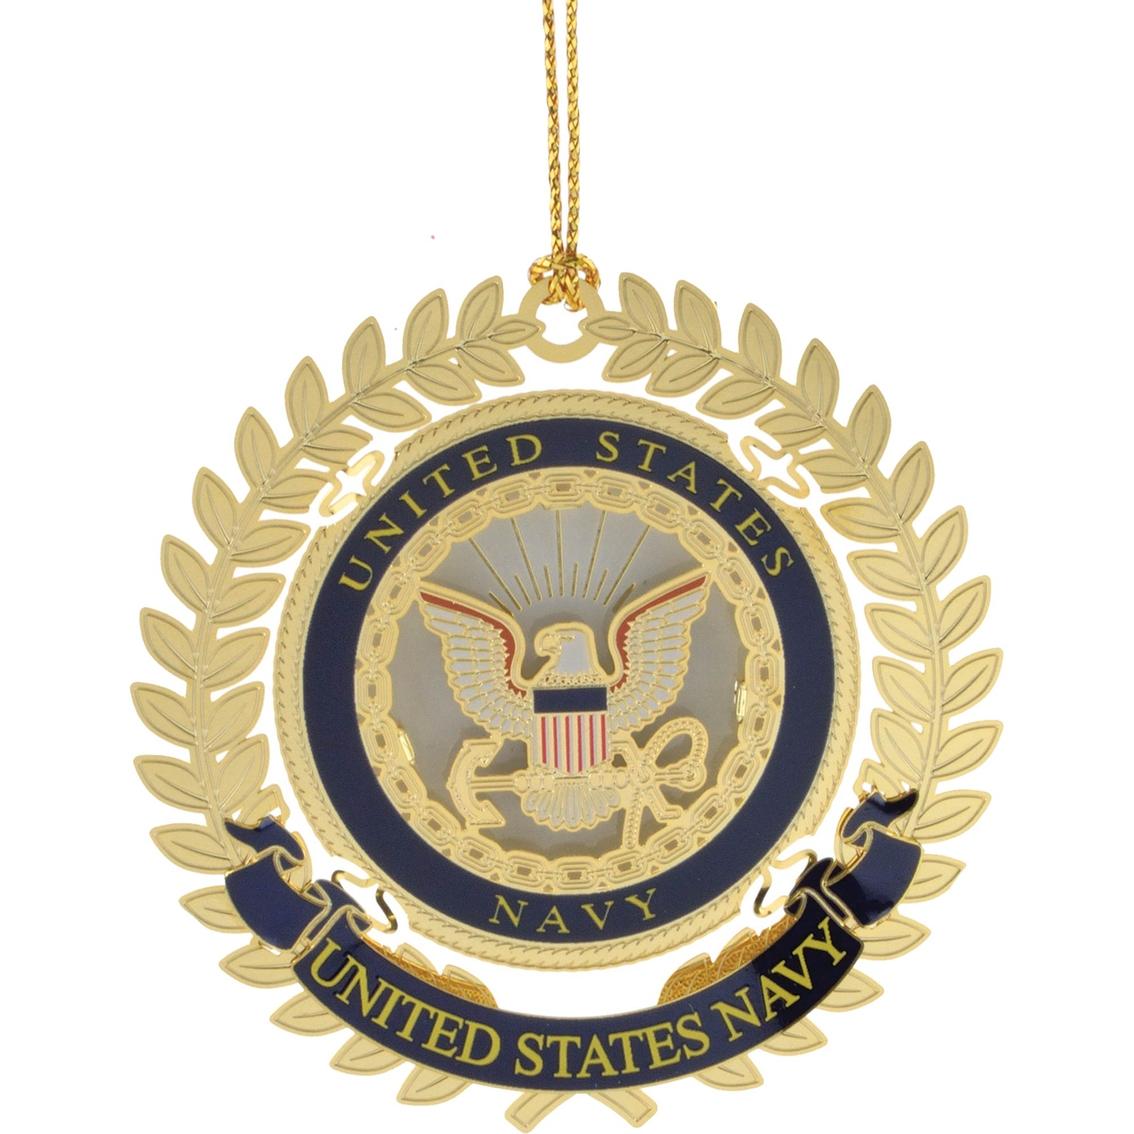 Chemart us navy logo ornament ornaments gifts food shop 1853 biocorpaavc